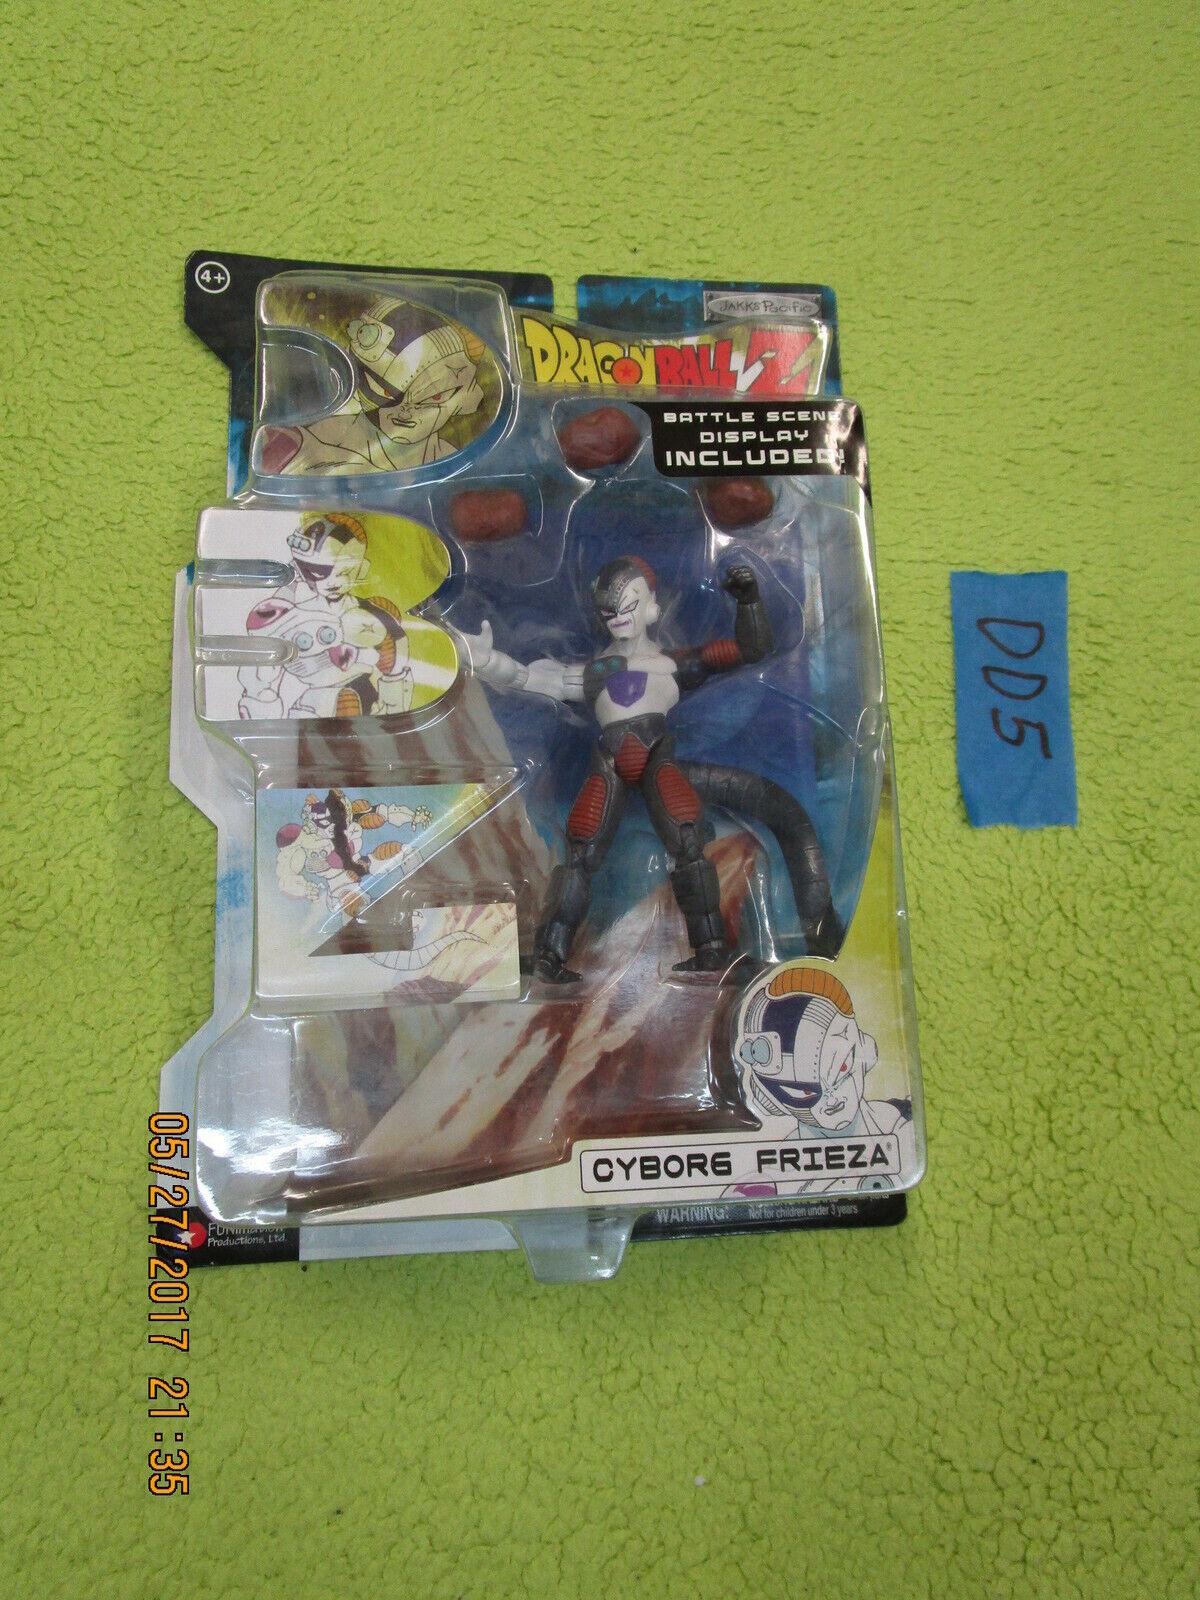 JAKKS Dragon Ball Z Lot DBZ Cyborg Frieza légendaire batailles Series 18 DRAGONBALL